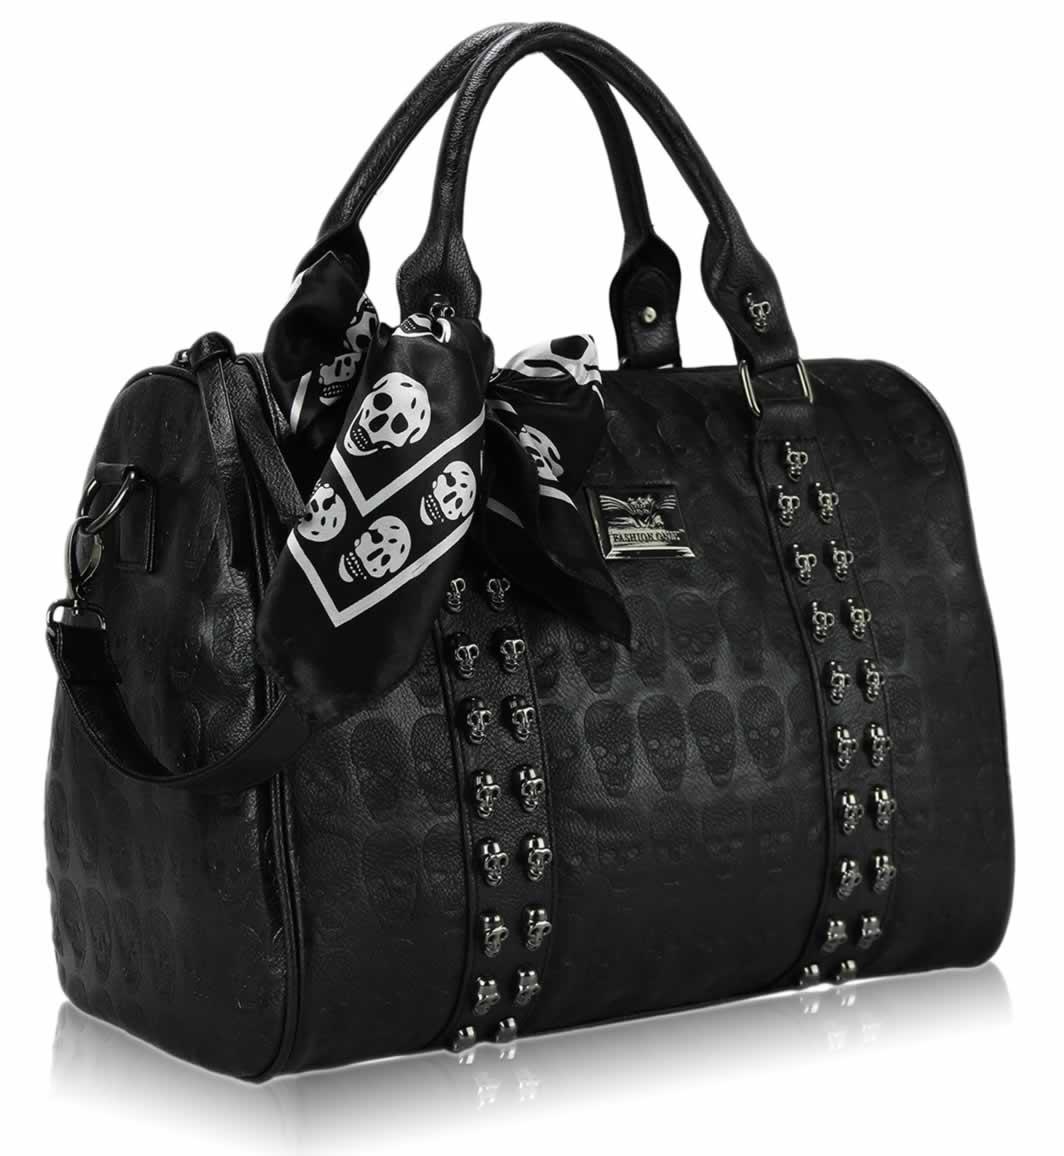 Sale Ls0050 Black Stunning Skull Studded Barrel Bag With Long Strap Ladies Handbags